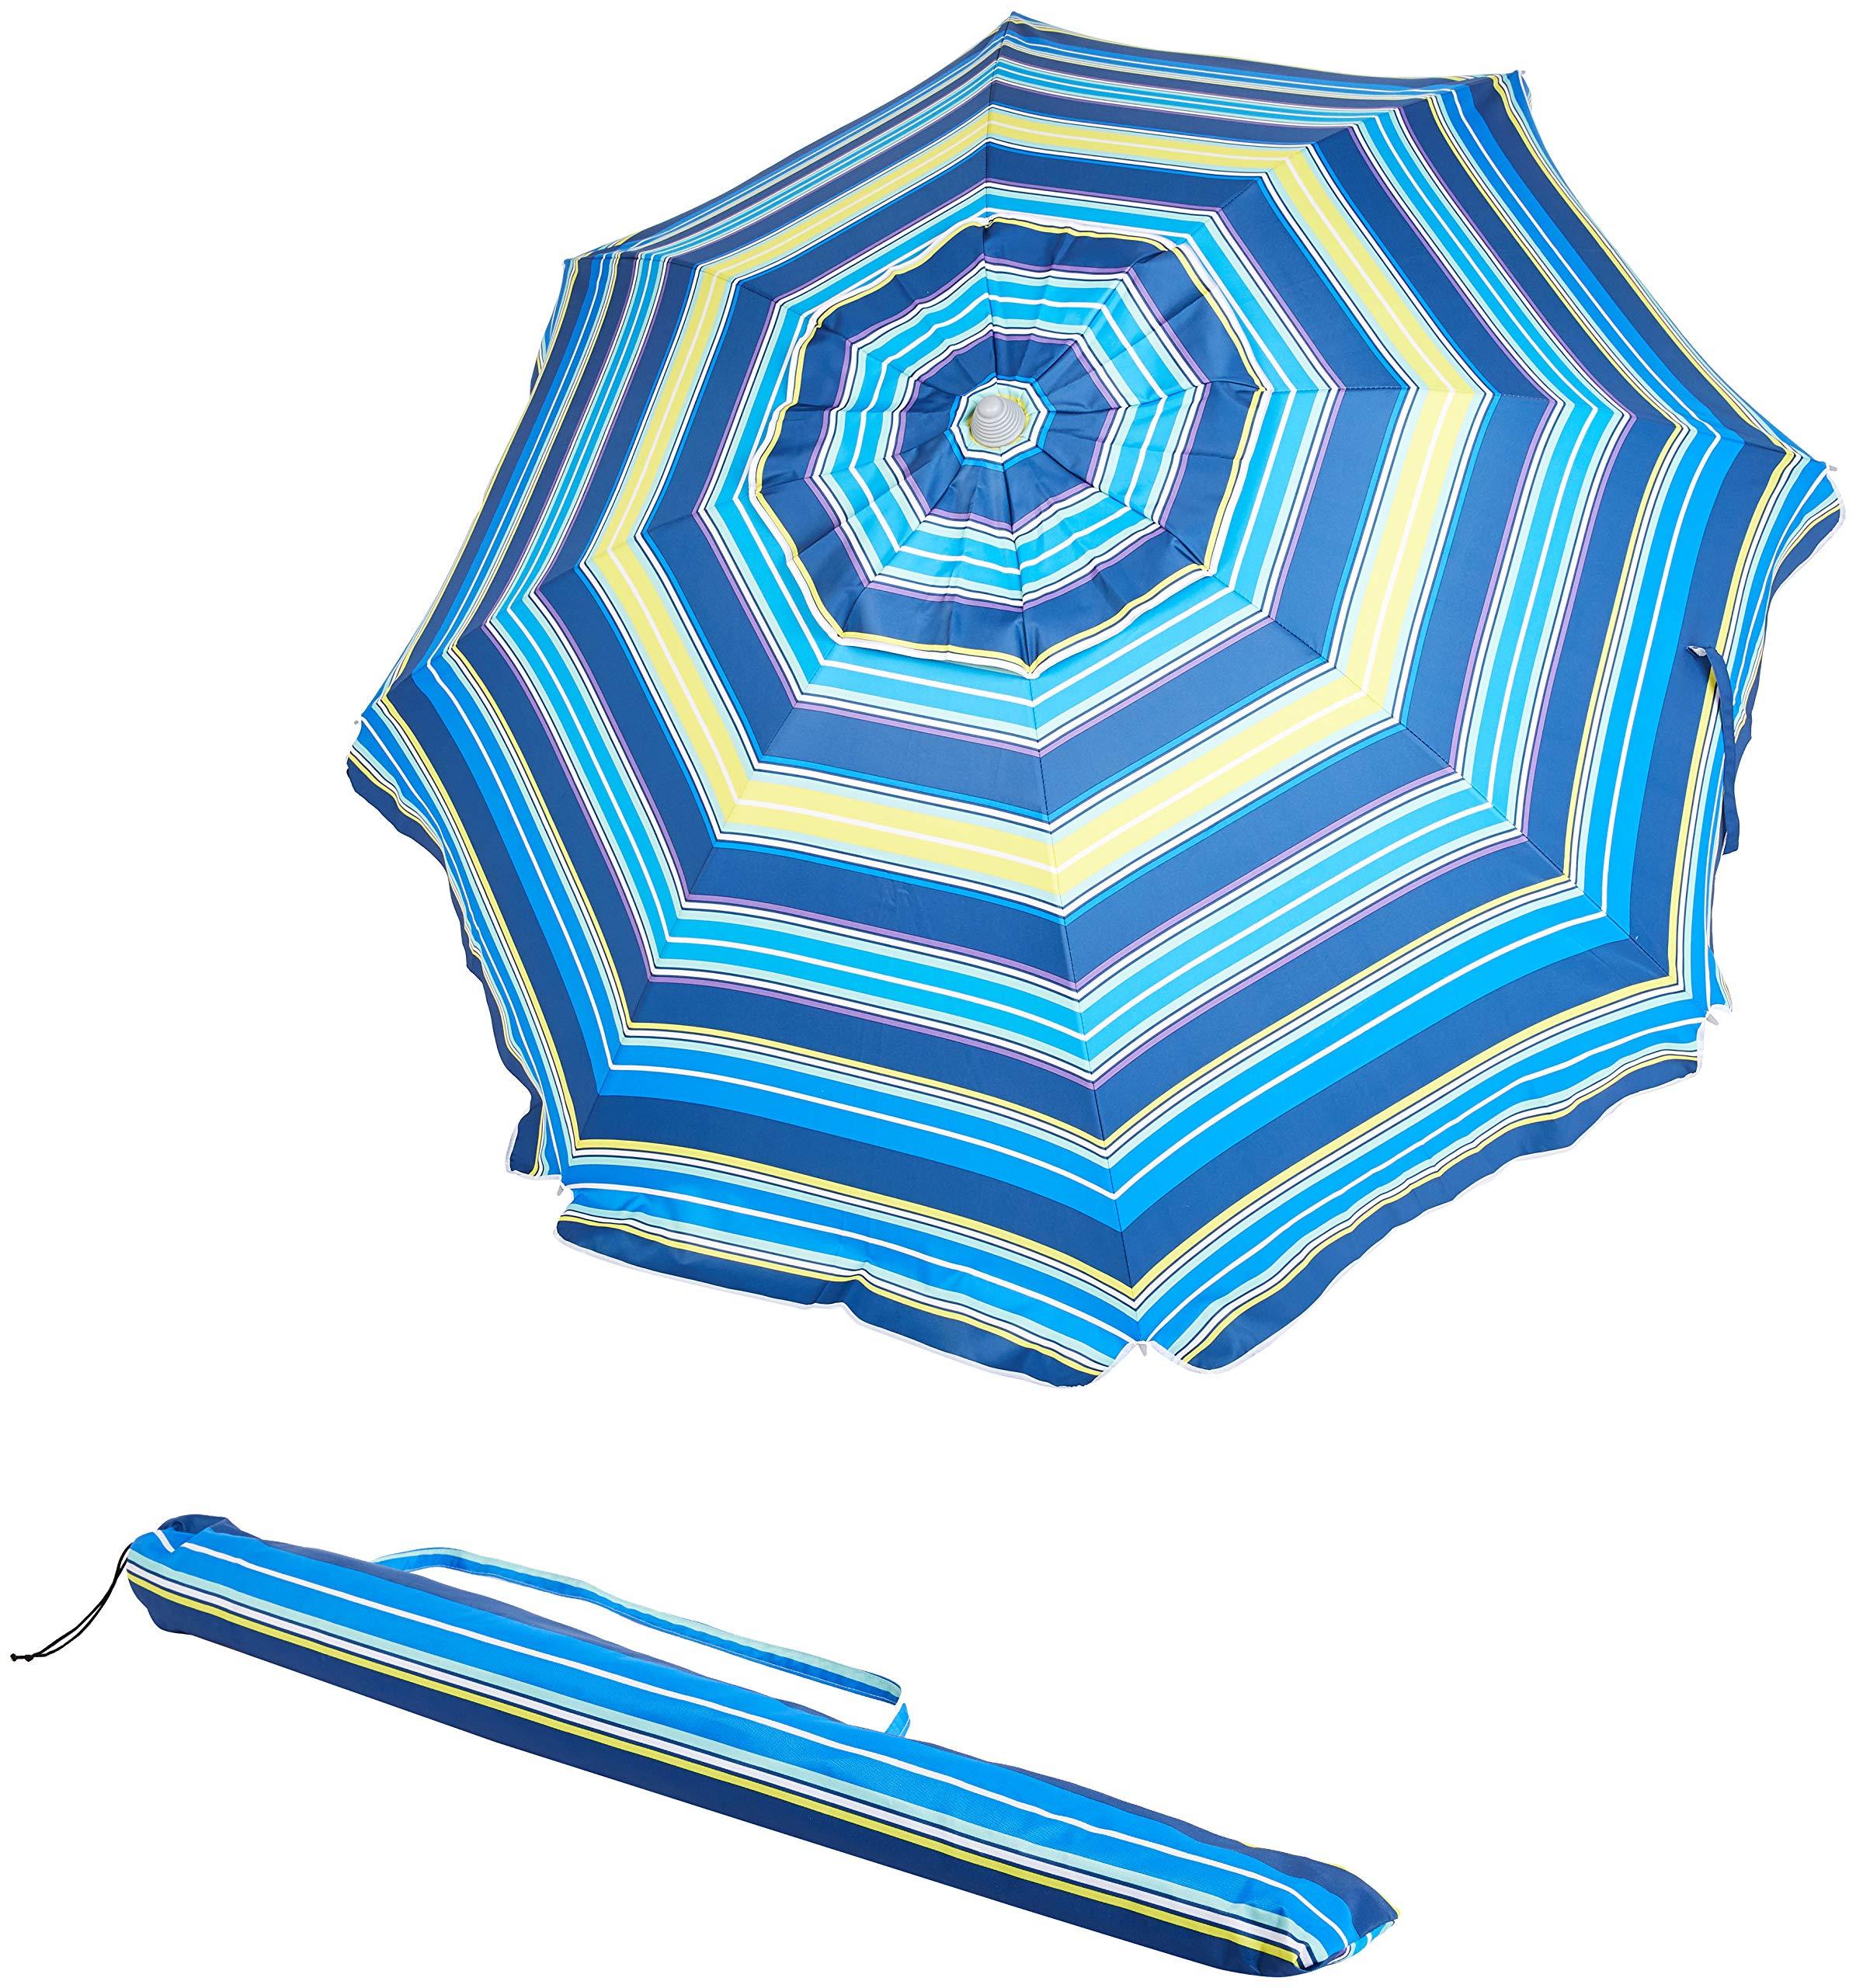 AmazonBasics Beach Sun Umbrella, Blue and Yellow Striped by AmazonBasics